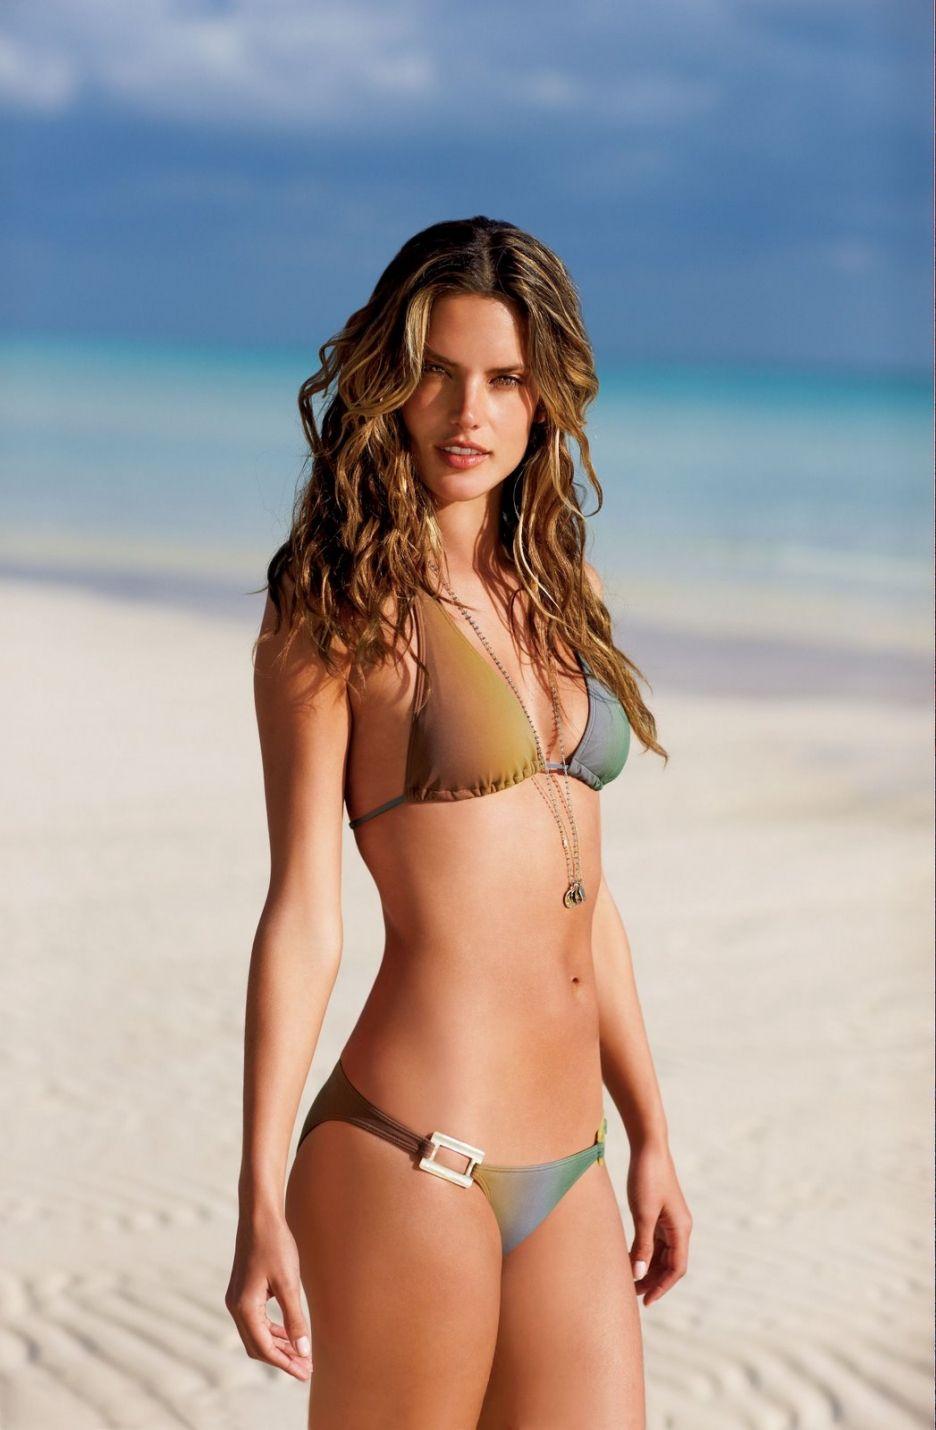 Alessandra Ambrosio Bikini Bodies Pic 26 of 35